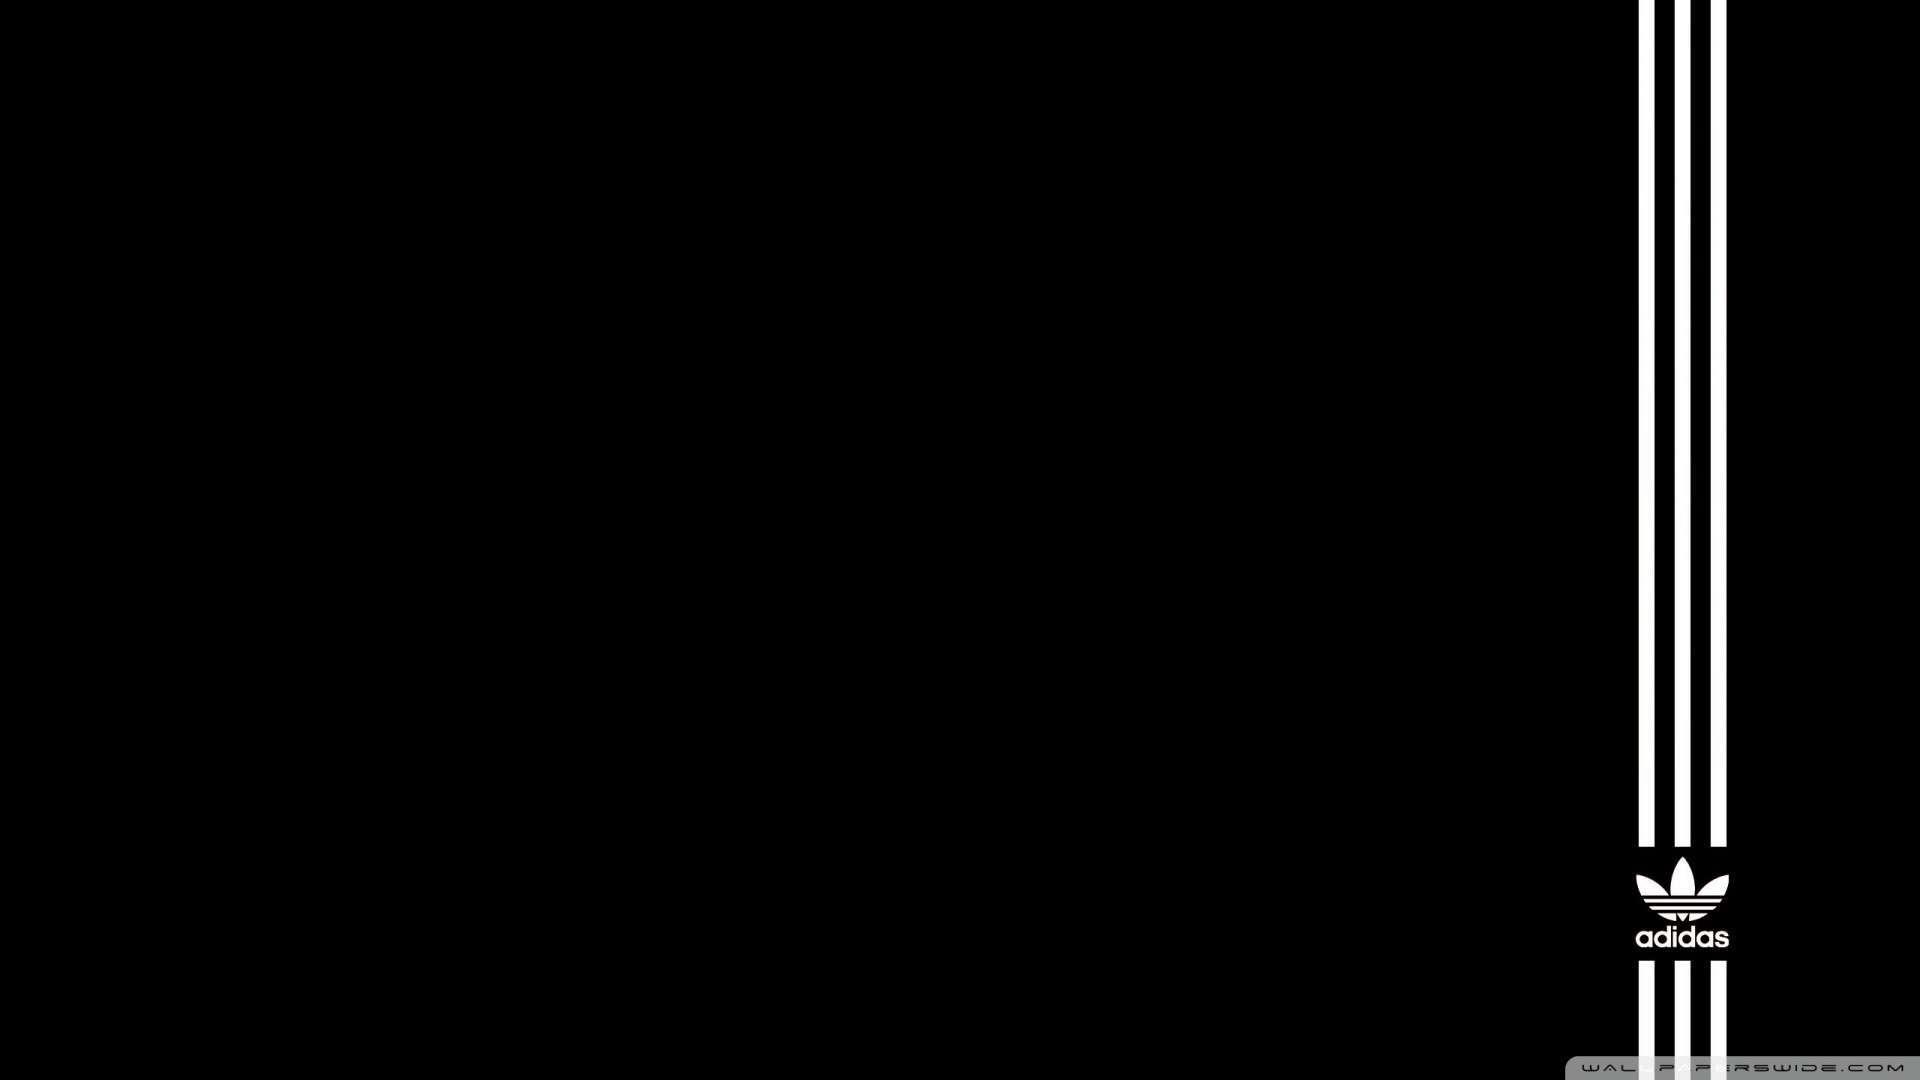 Hd wallpaper upload - Wallpaper Adidas Black Background Wallpaper 1080p Hd Upload At